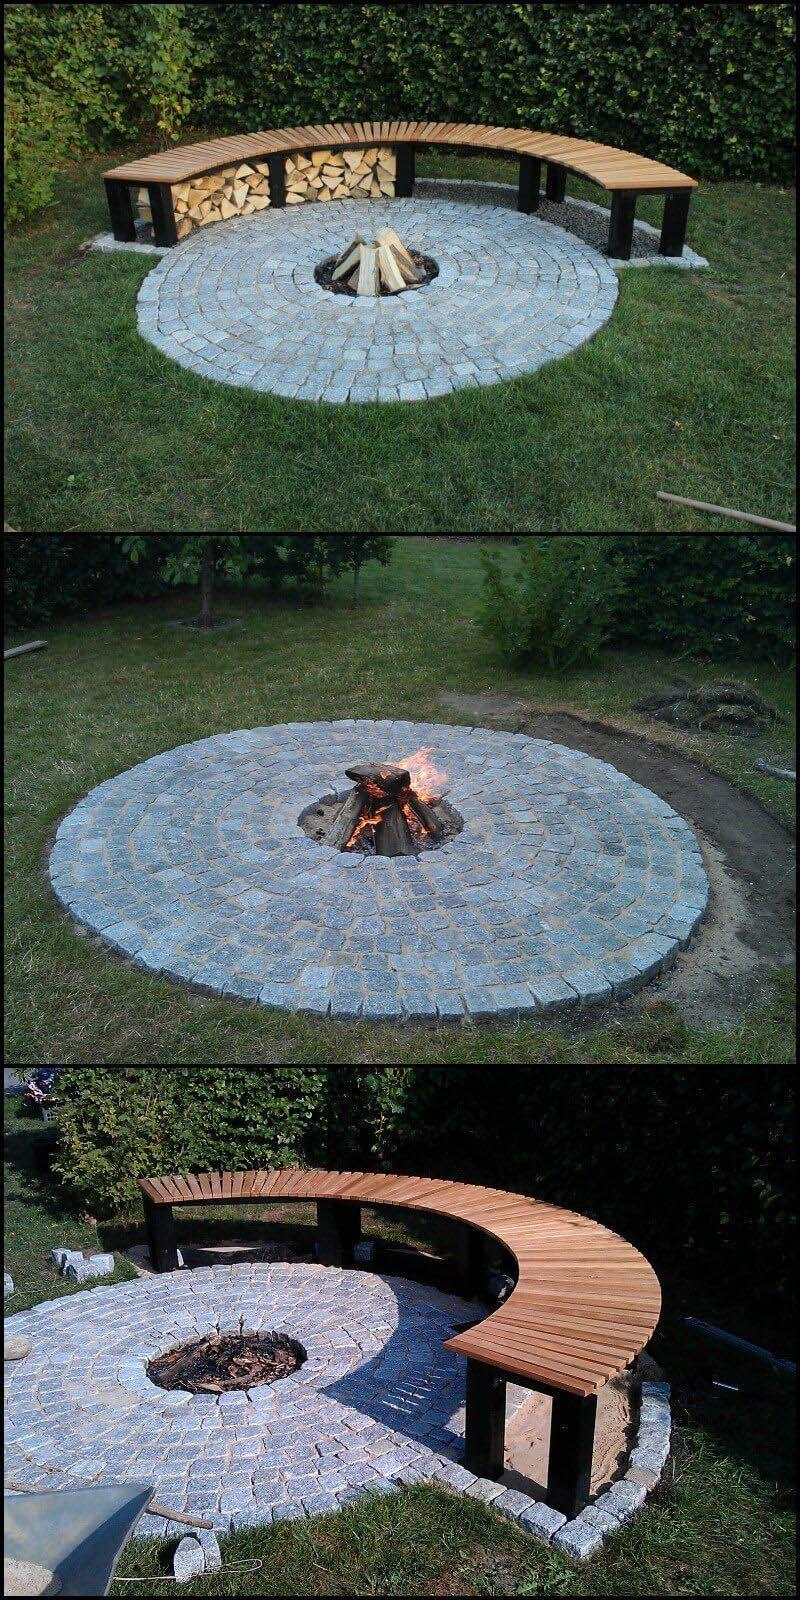 Inspiring Diy Fire Pit Plans Ideas To